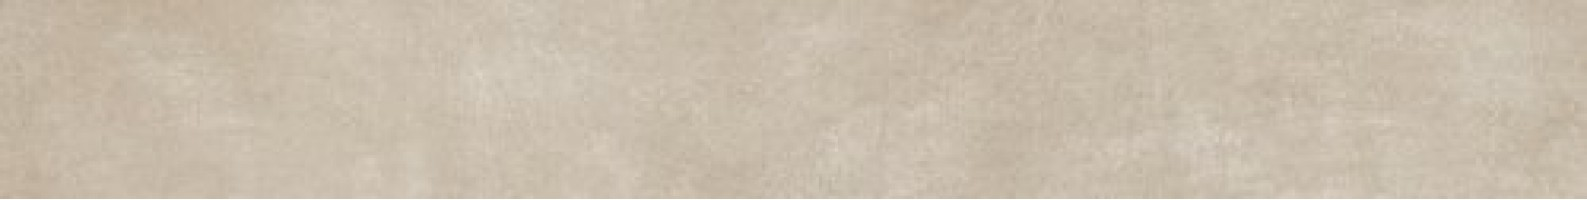 Подступенник Ape Ceramica Tabica Work B Taupe 15x120 A034322